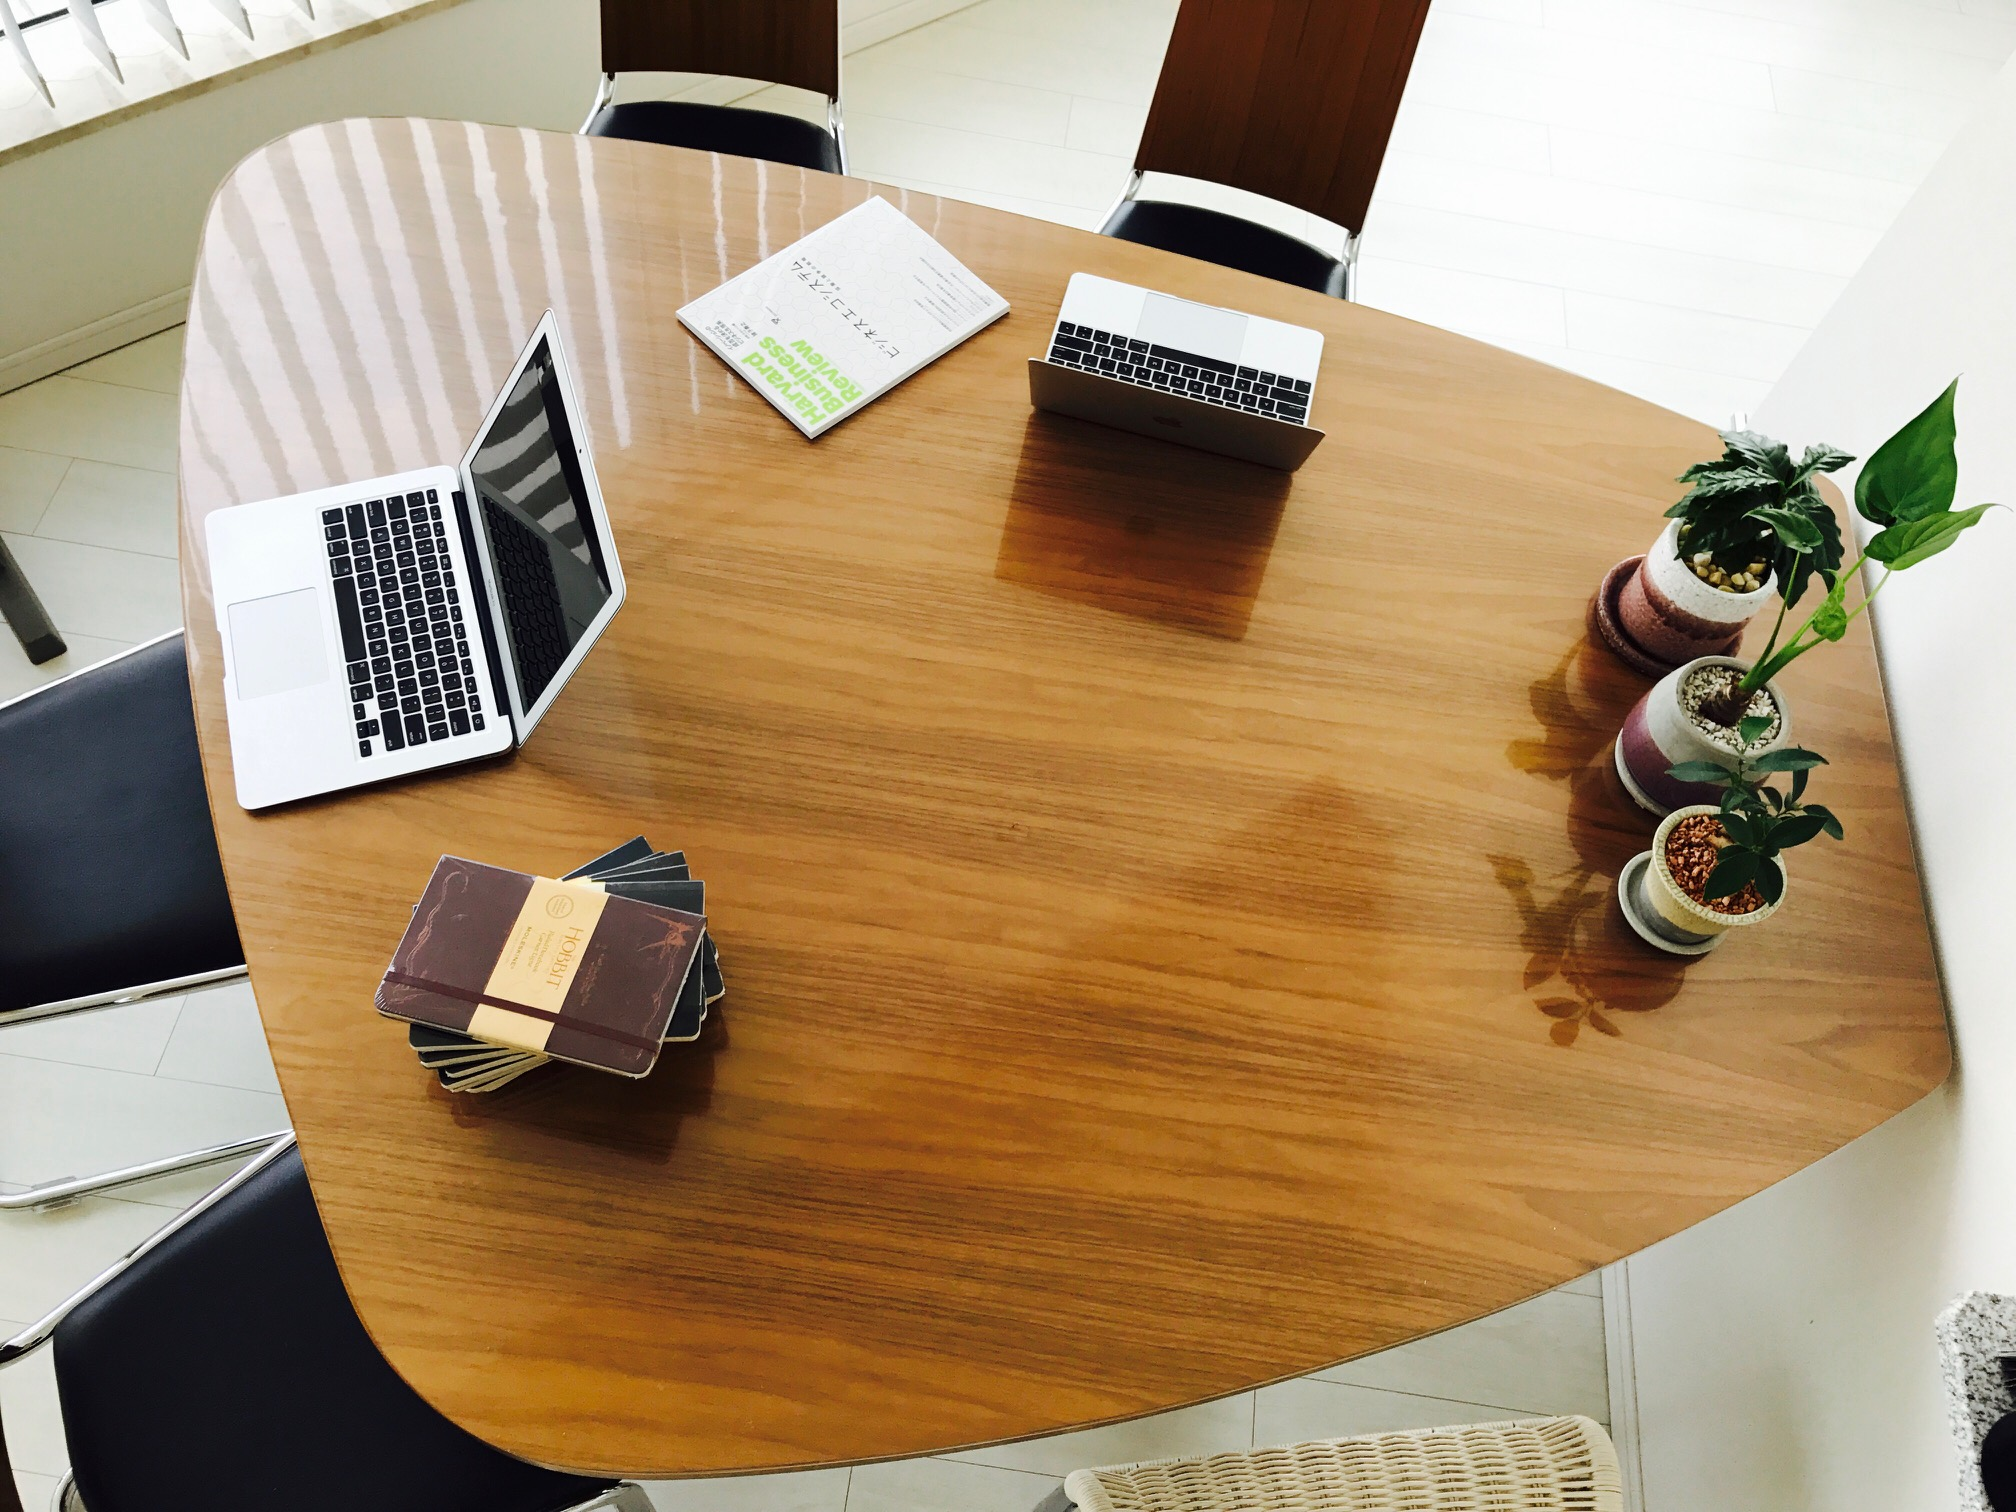 ACTUS Dining Table TECTA M21